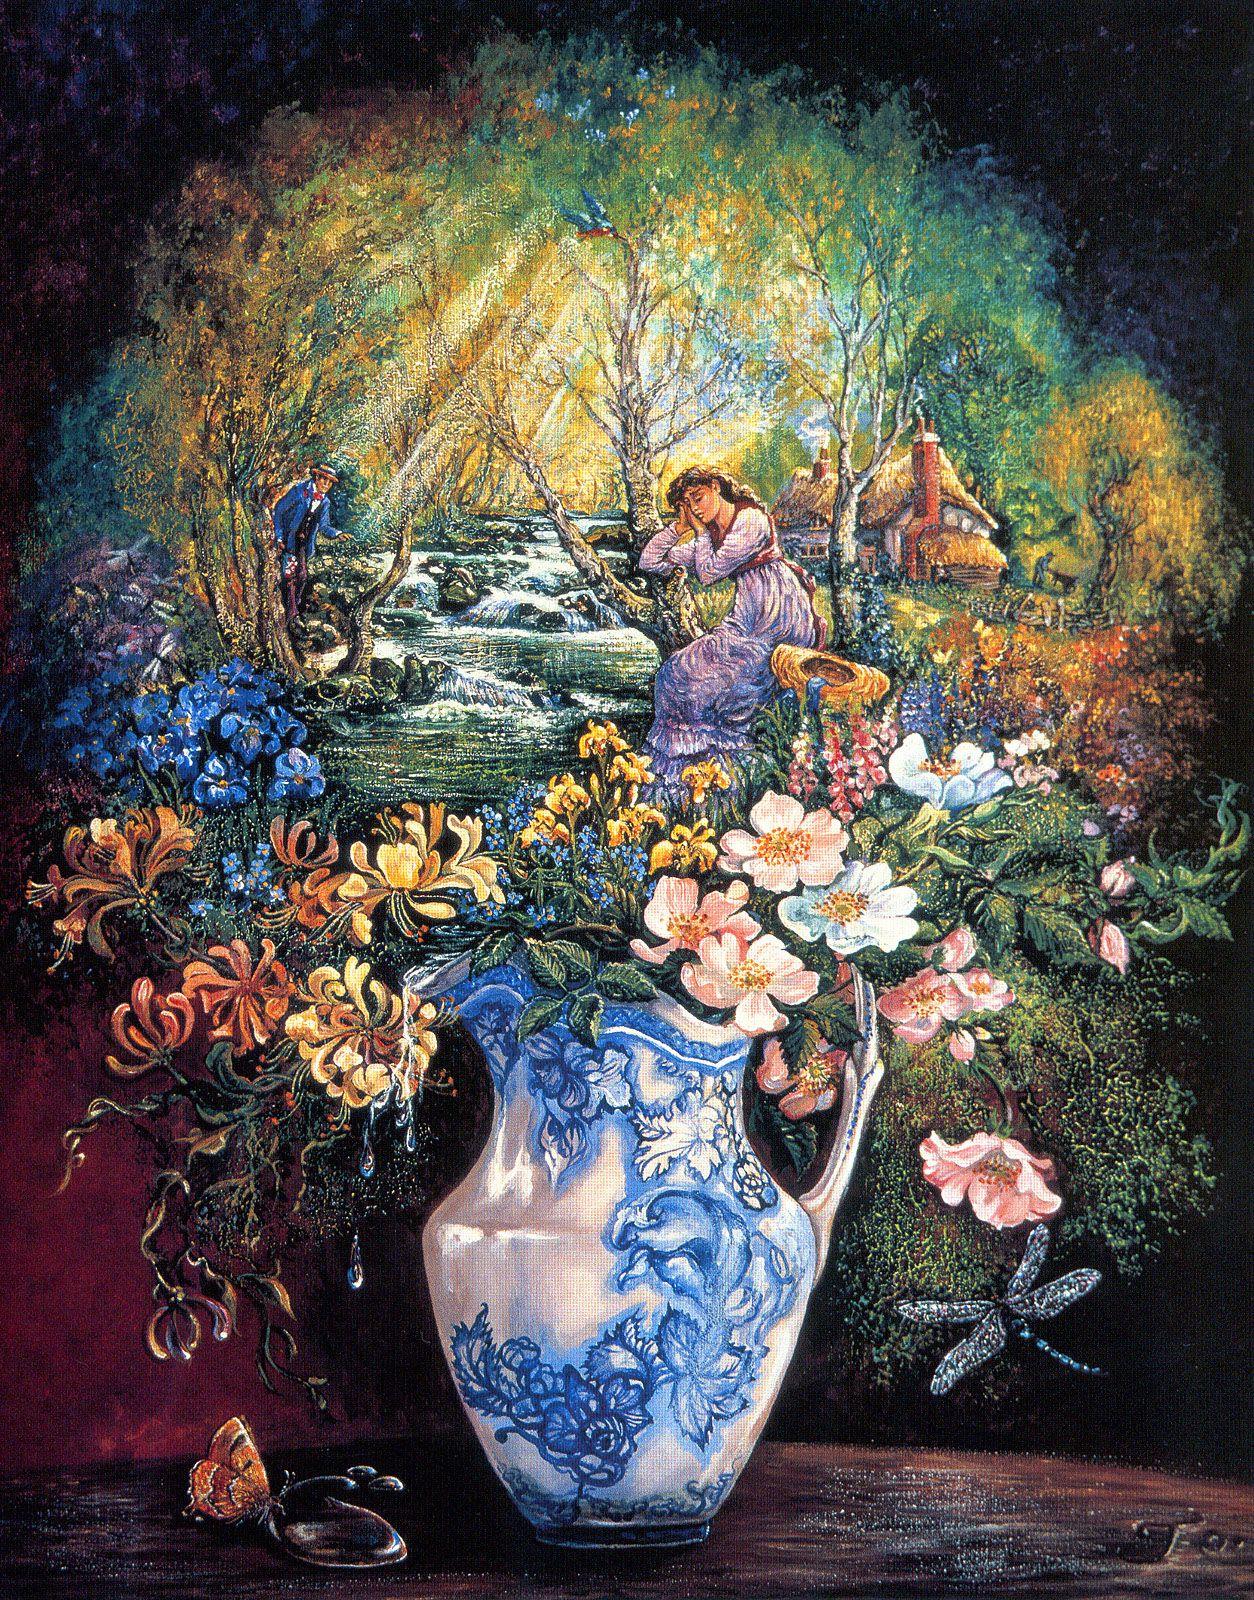 josephine_wall_fantasy-surrealism_the water jug.jpg (1254×1600)